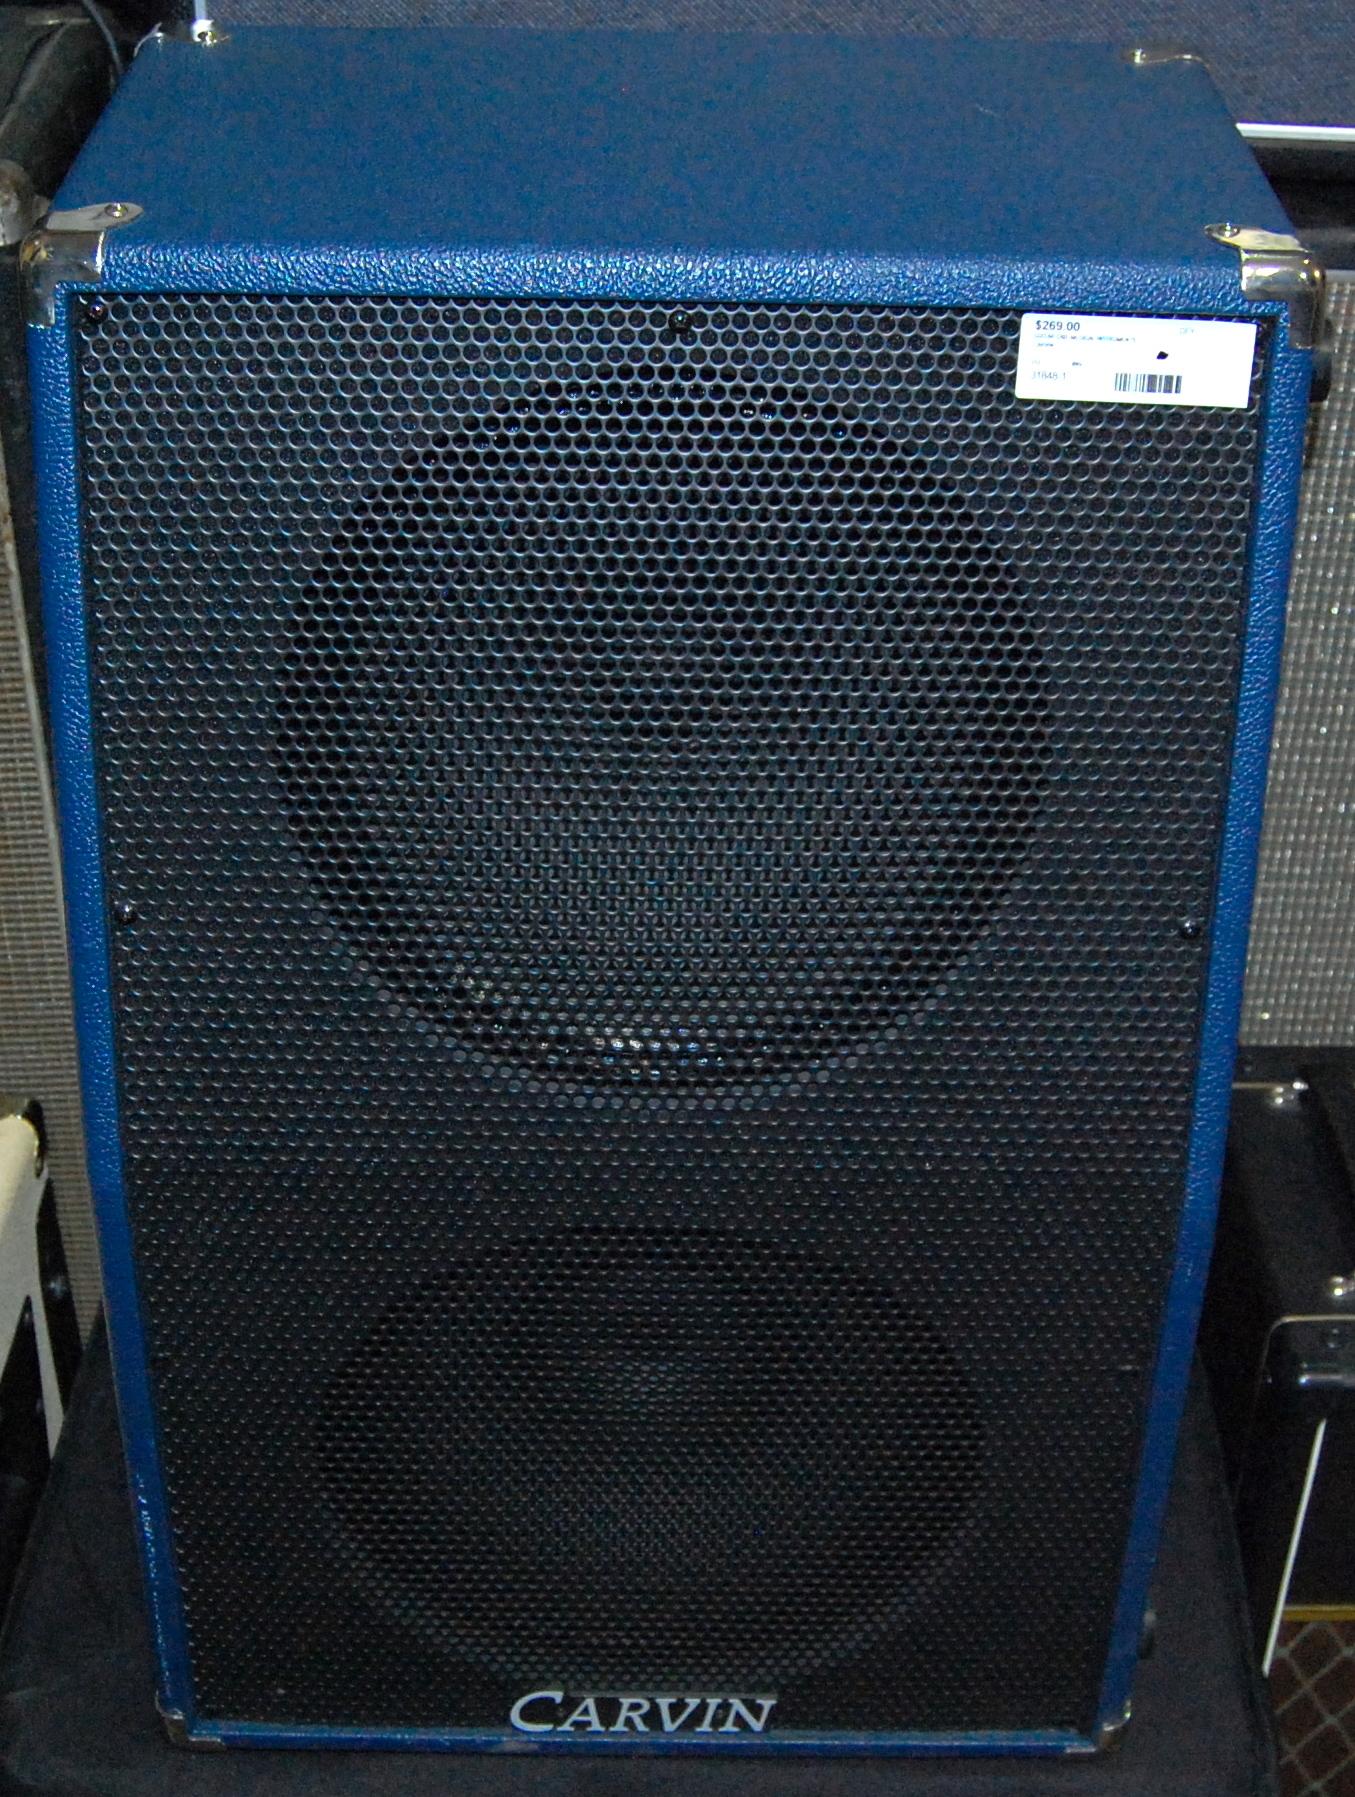 CARVIN USA Vertical 2x12 212 Guitar Speaker Cabinet Cab